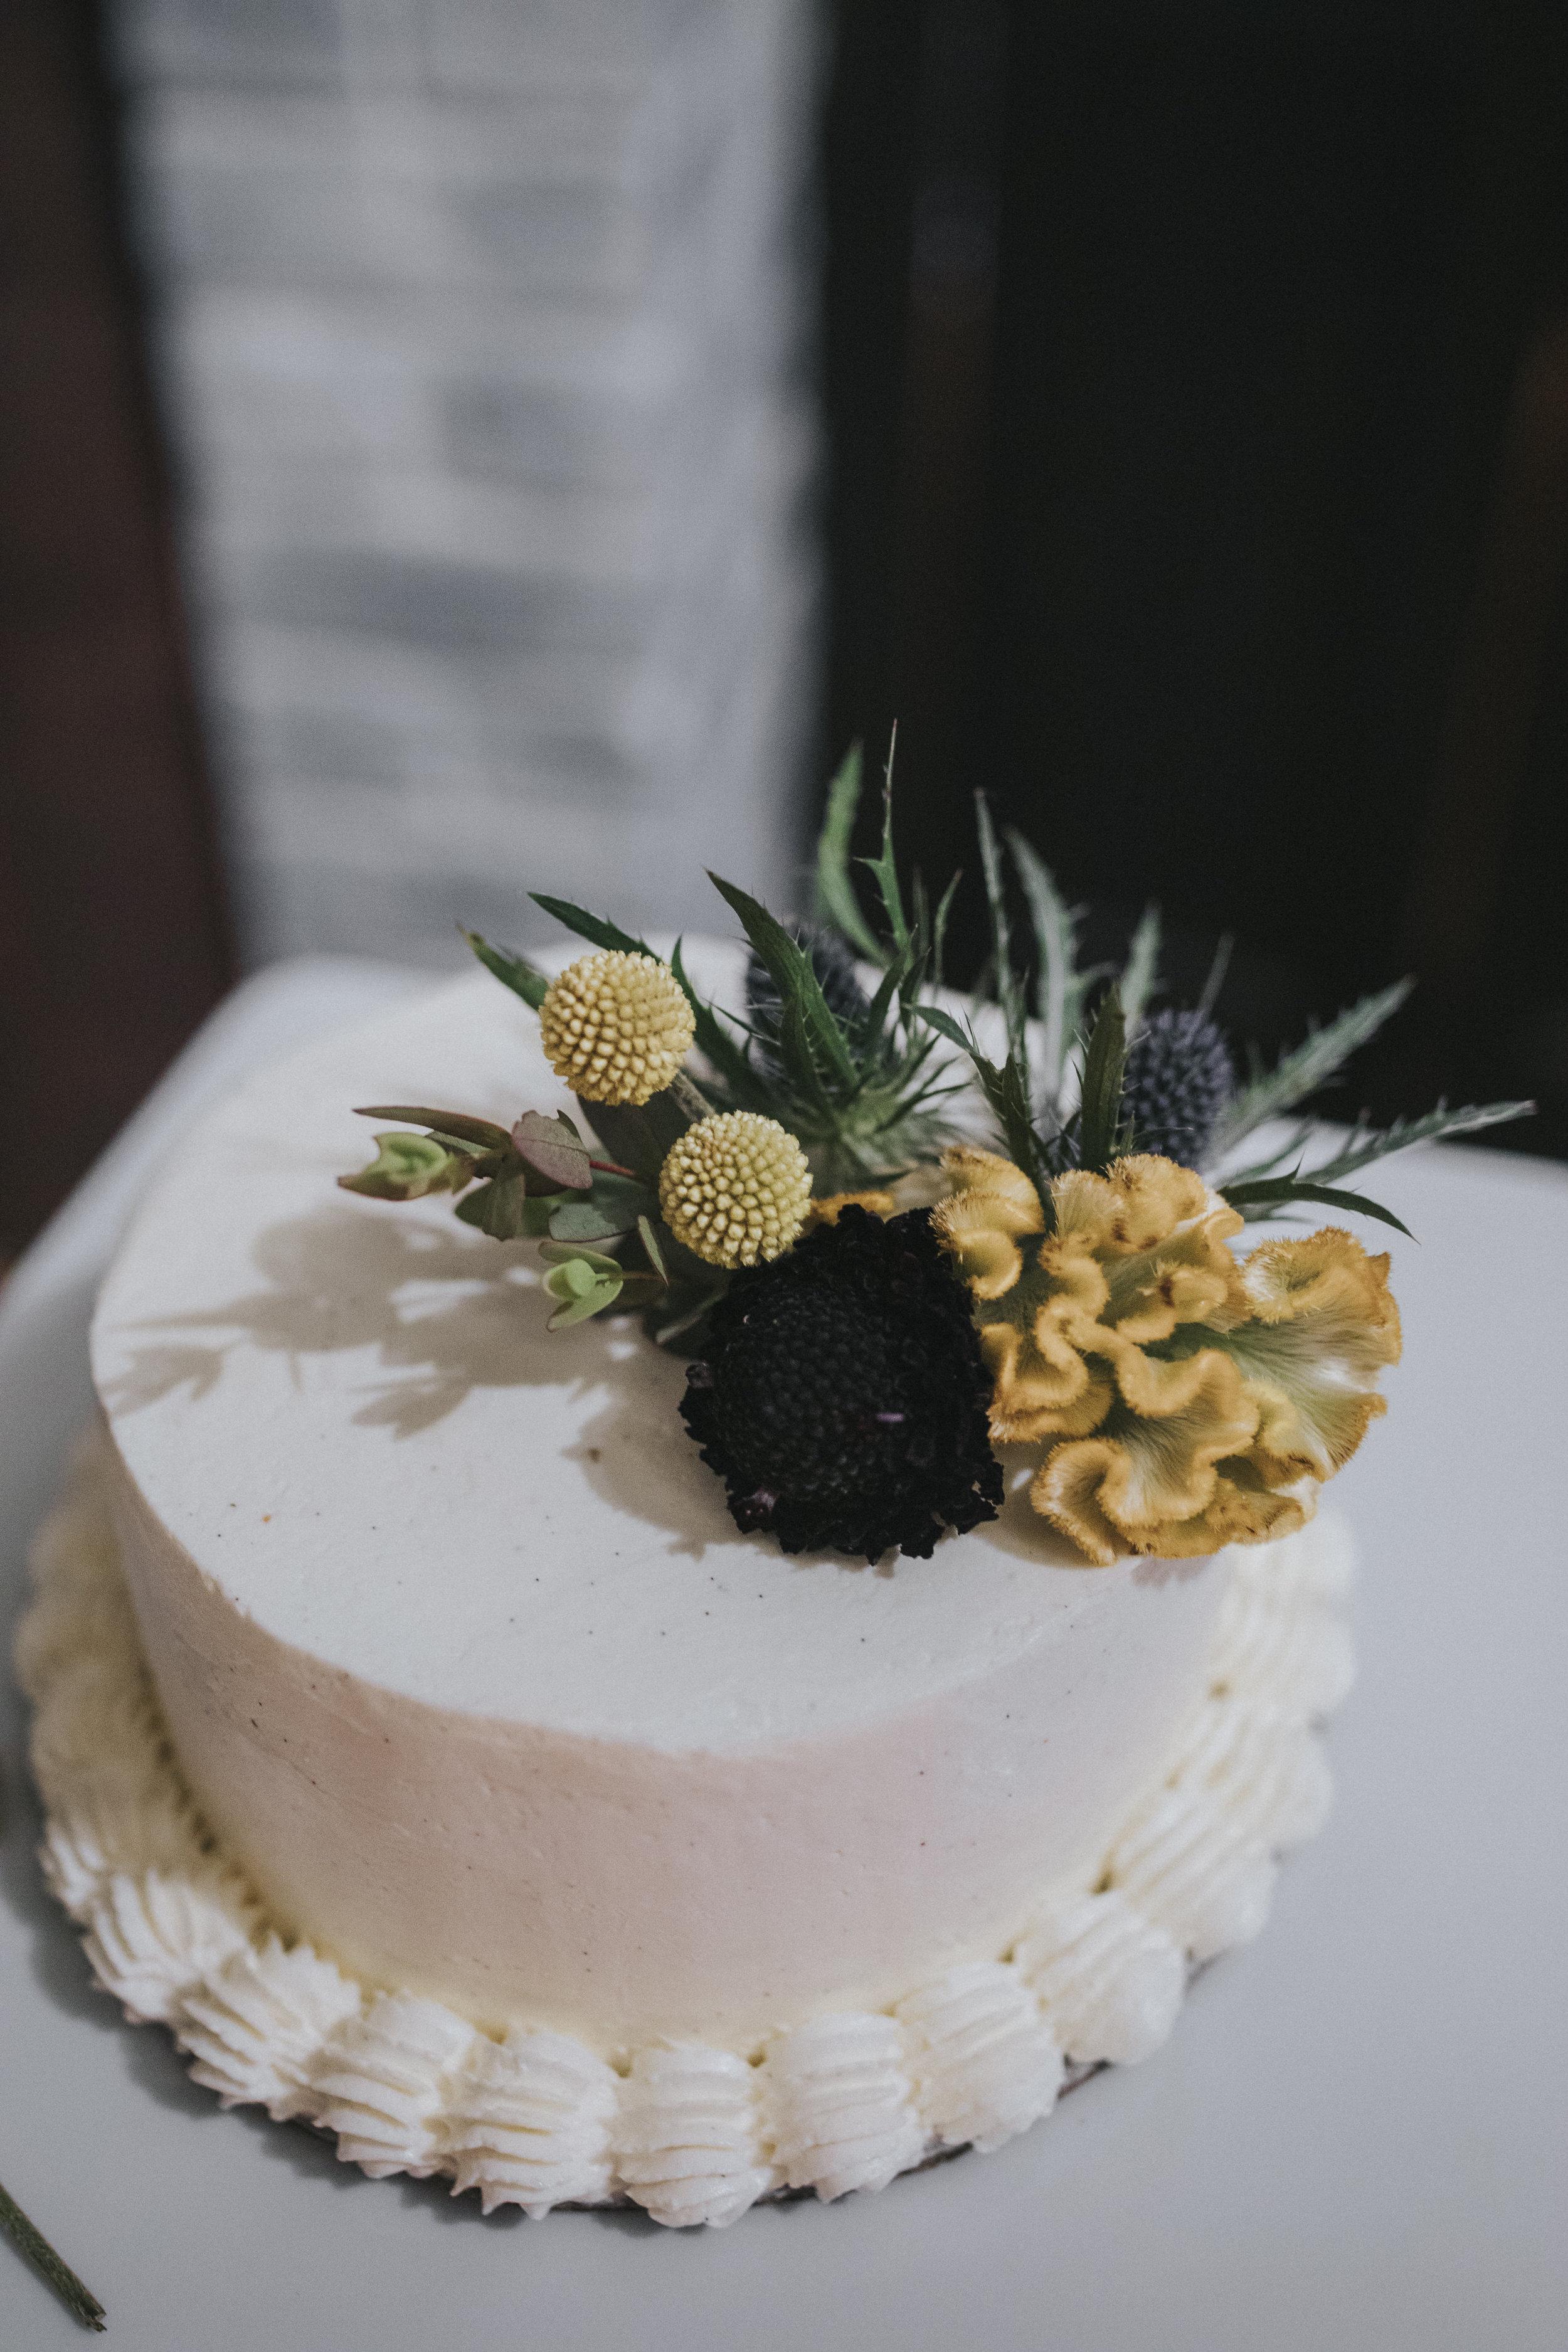 191 tiny-luxe-weddings-custom-elopement-summer-omaha-old-market.jpg